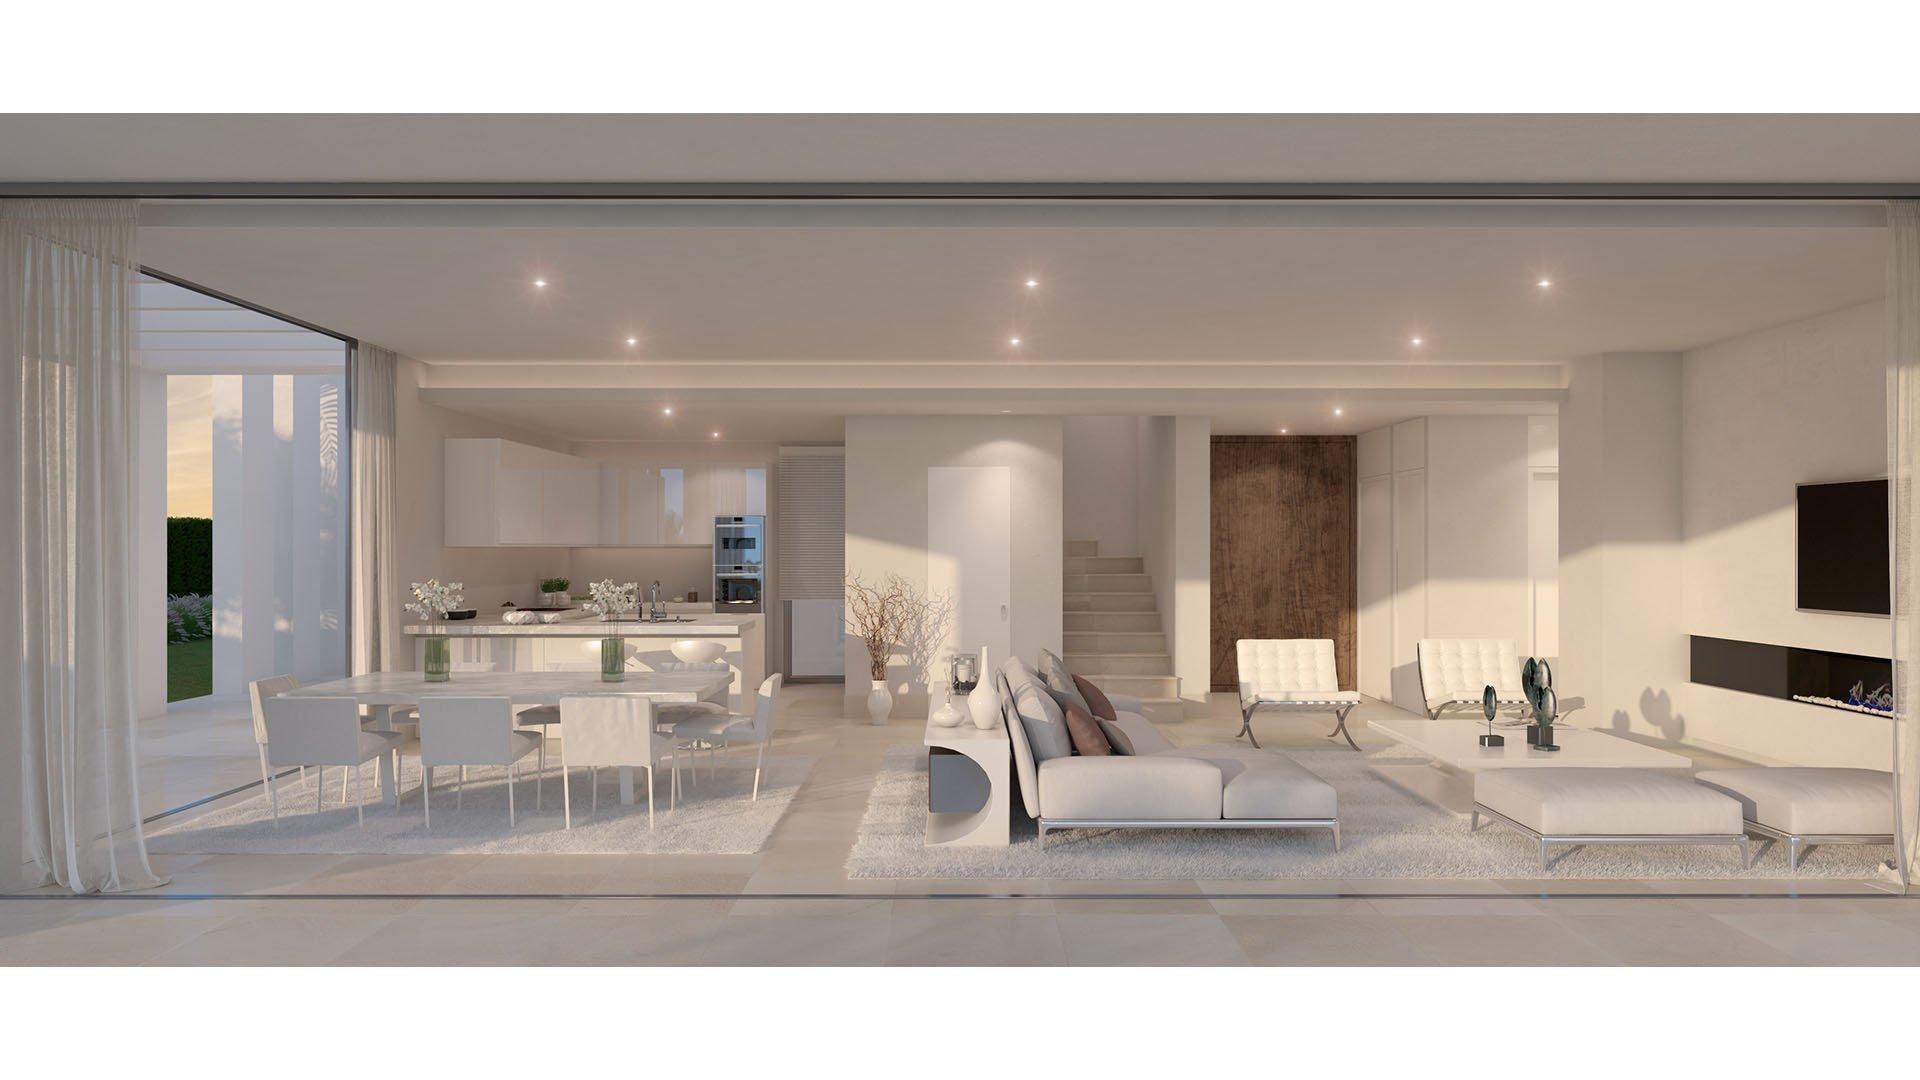 La finca de La Cala: Modern, chique residences in La Cala Golf – Mijas